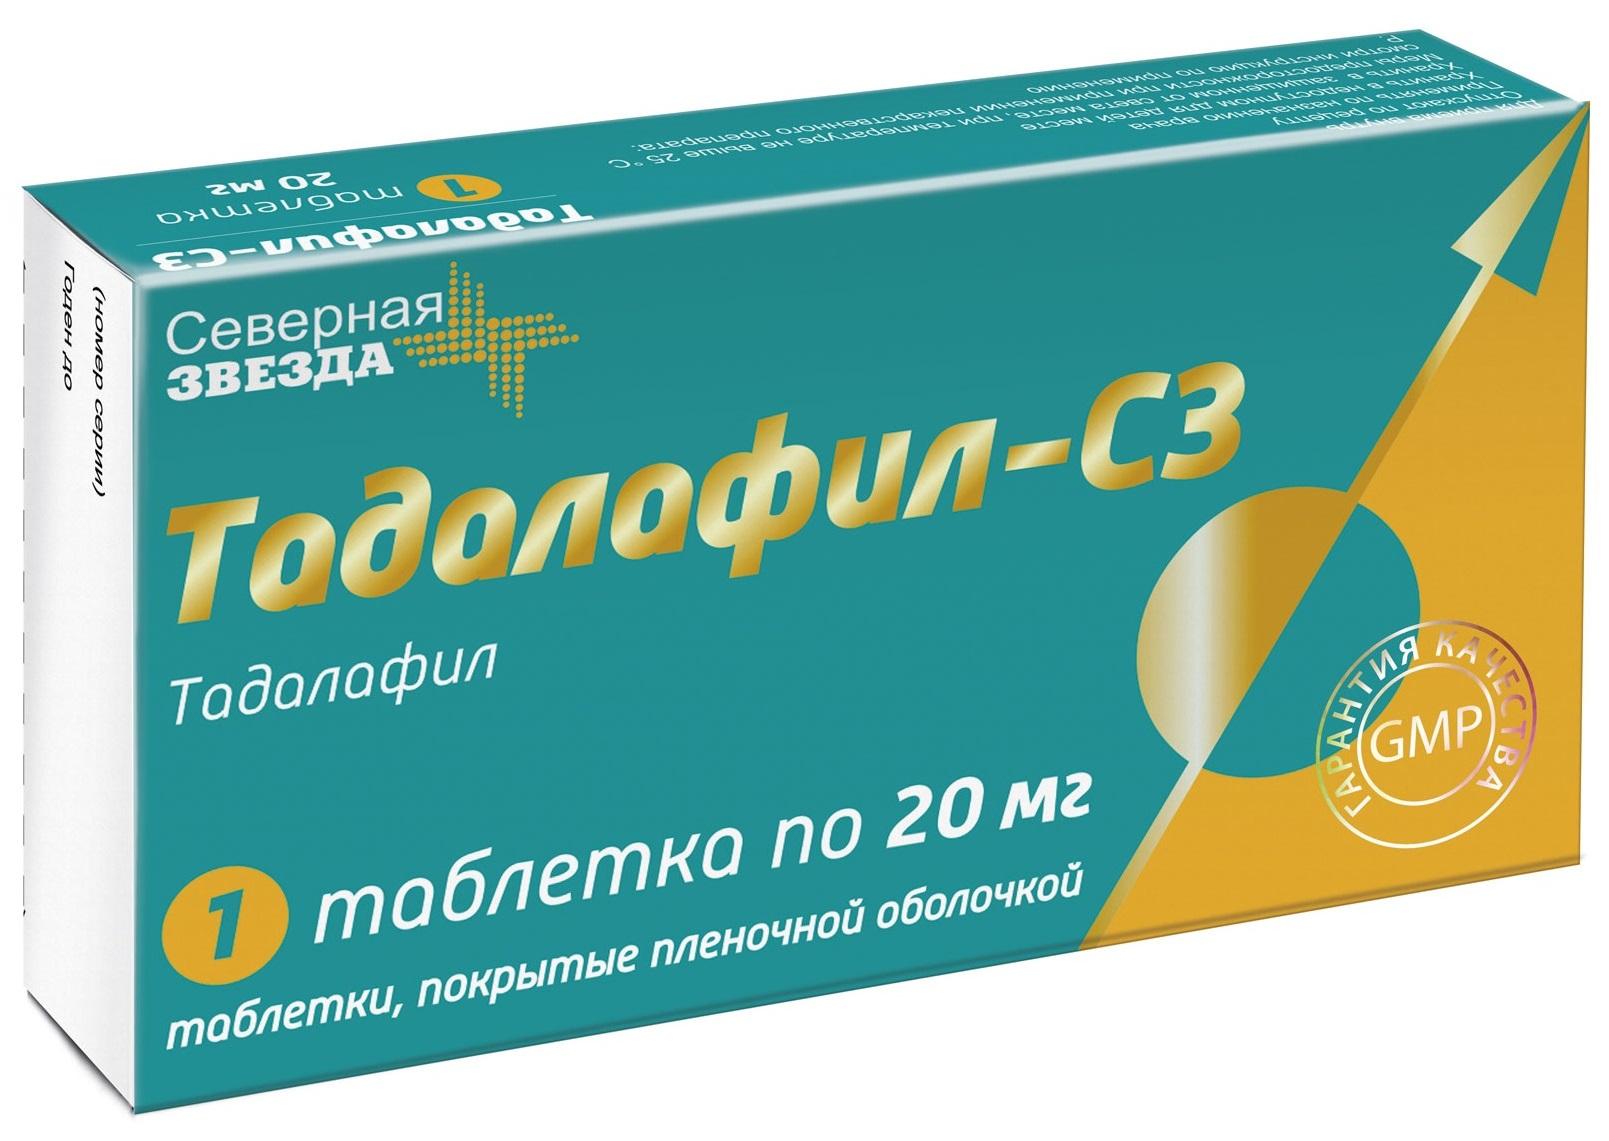 Тадалафил-СЗ табл. п.п.о. 20 мг №1